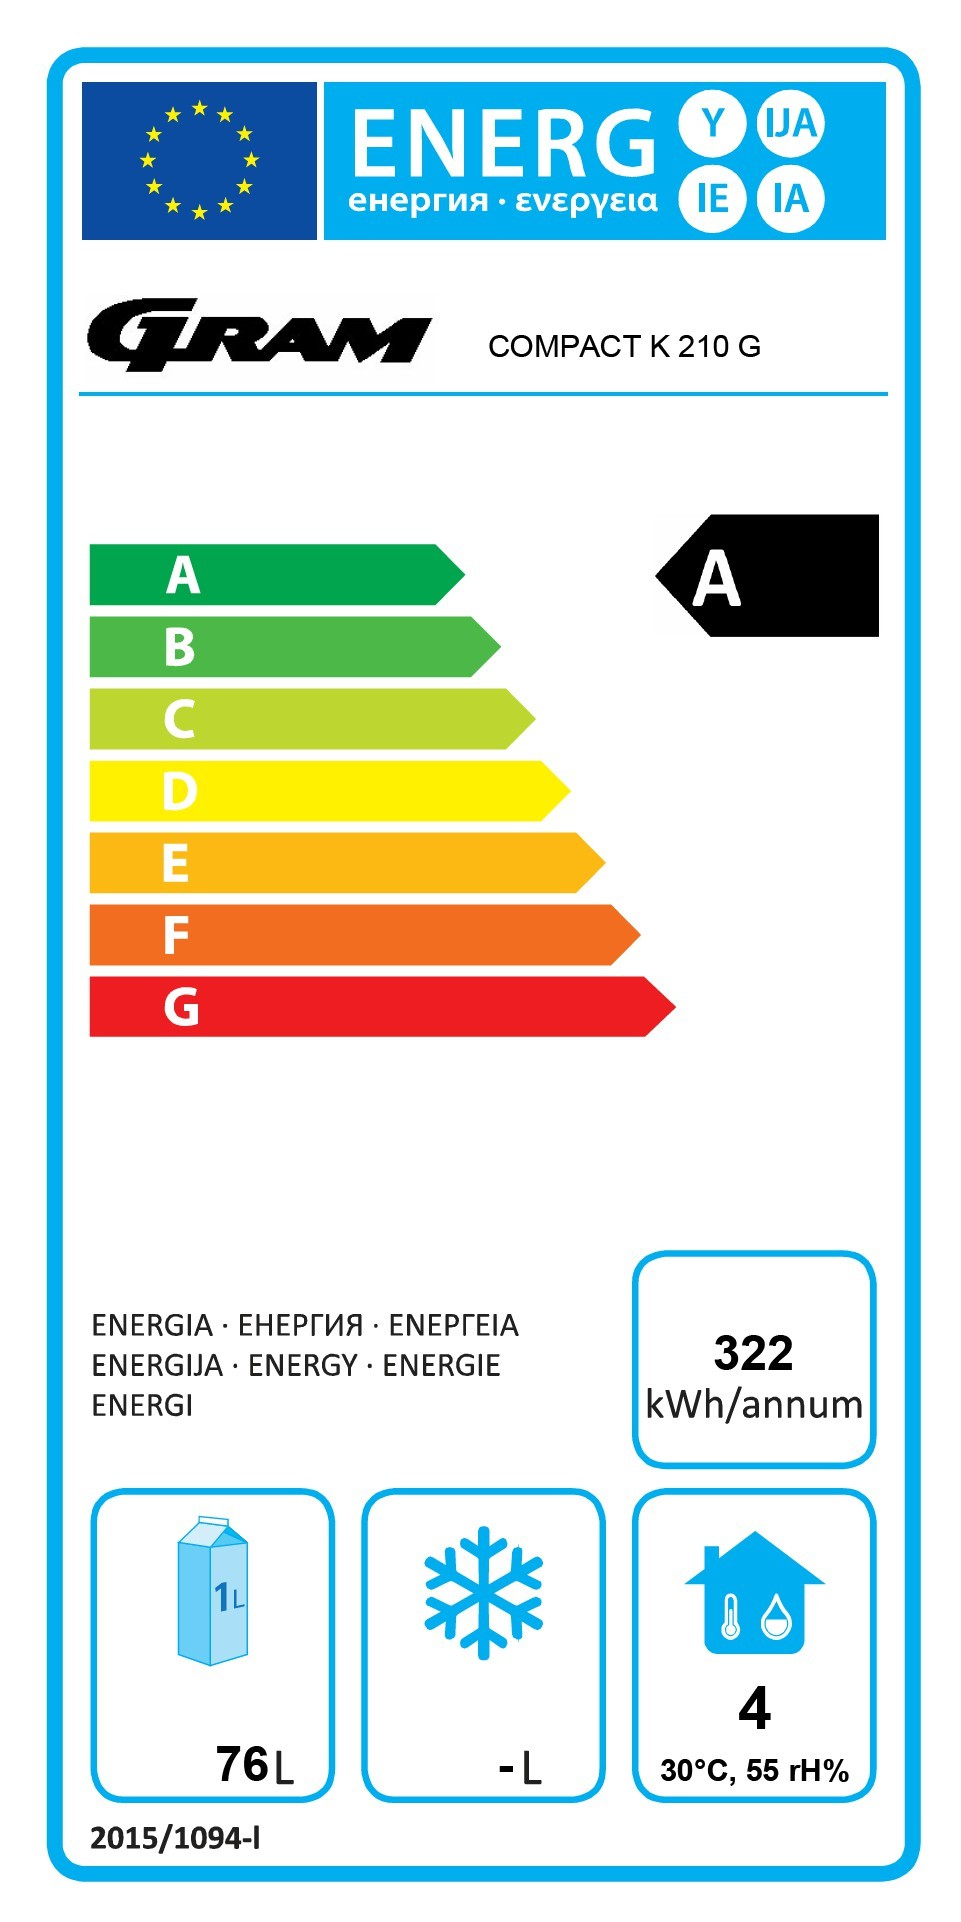 COMPACT KG 210 RG 3W 125 Ltr Undercounter Glass Door Fridge Energy Rating